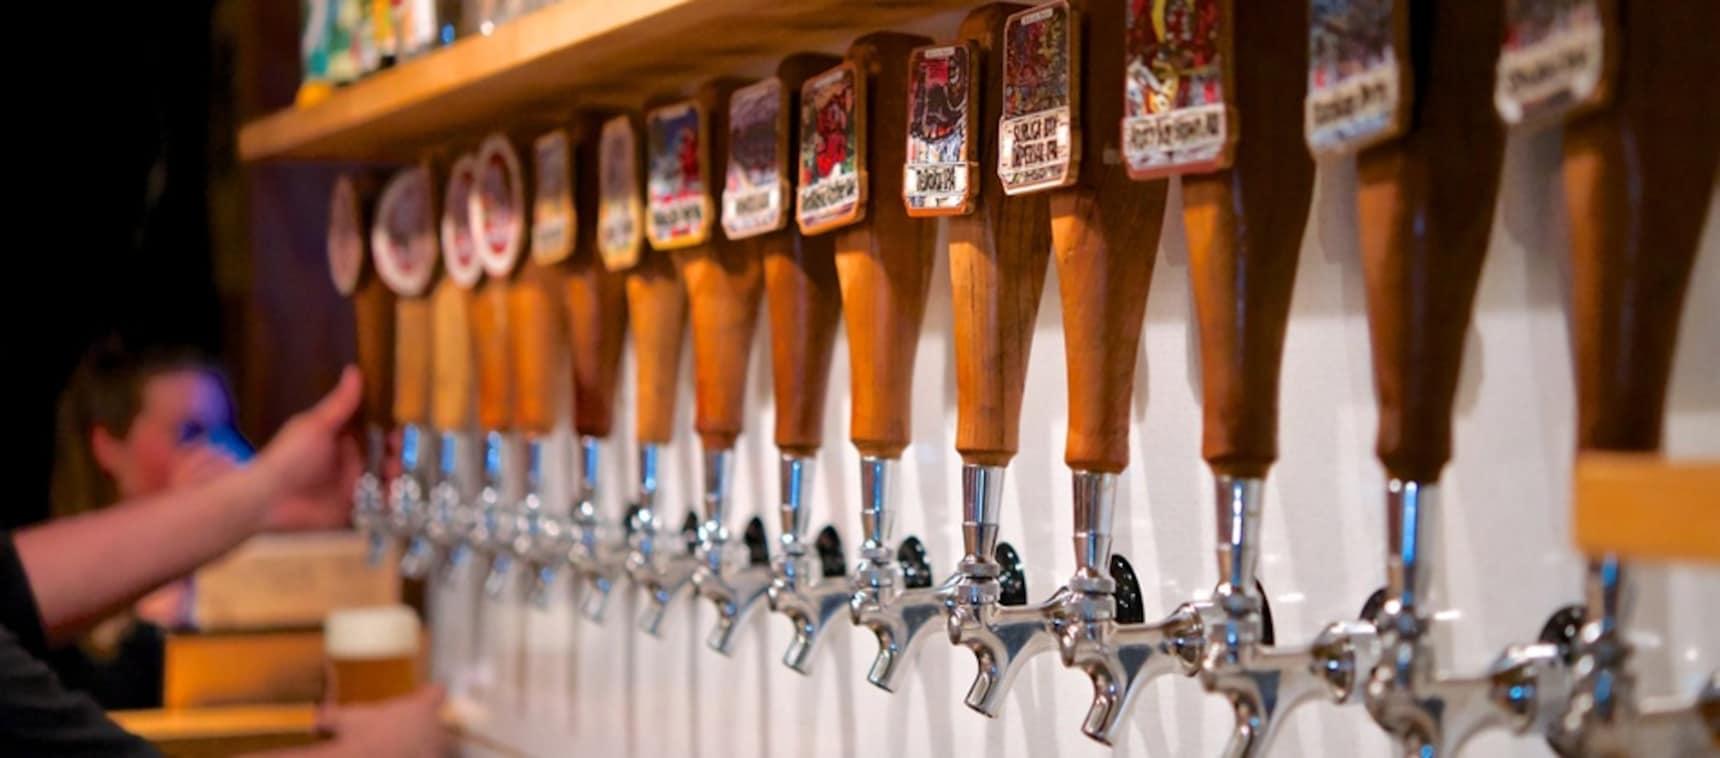 The 10 Best Craft Beers in Japan